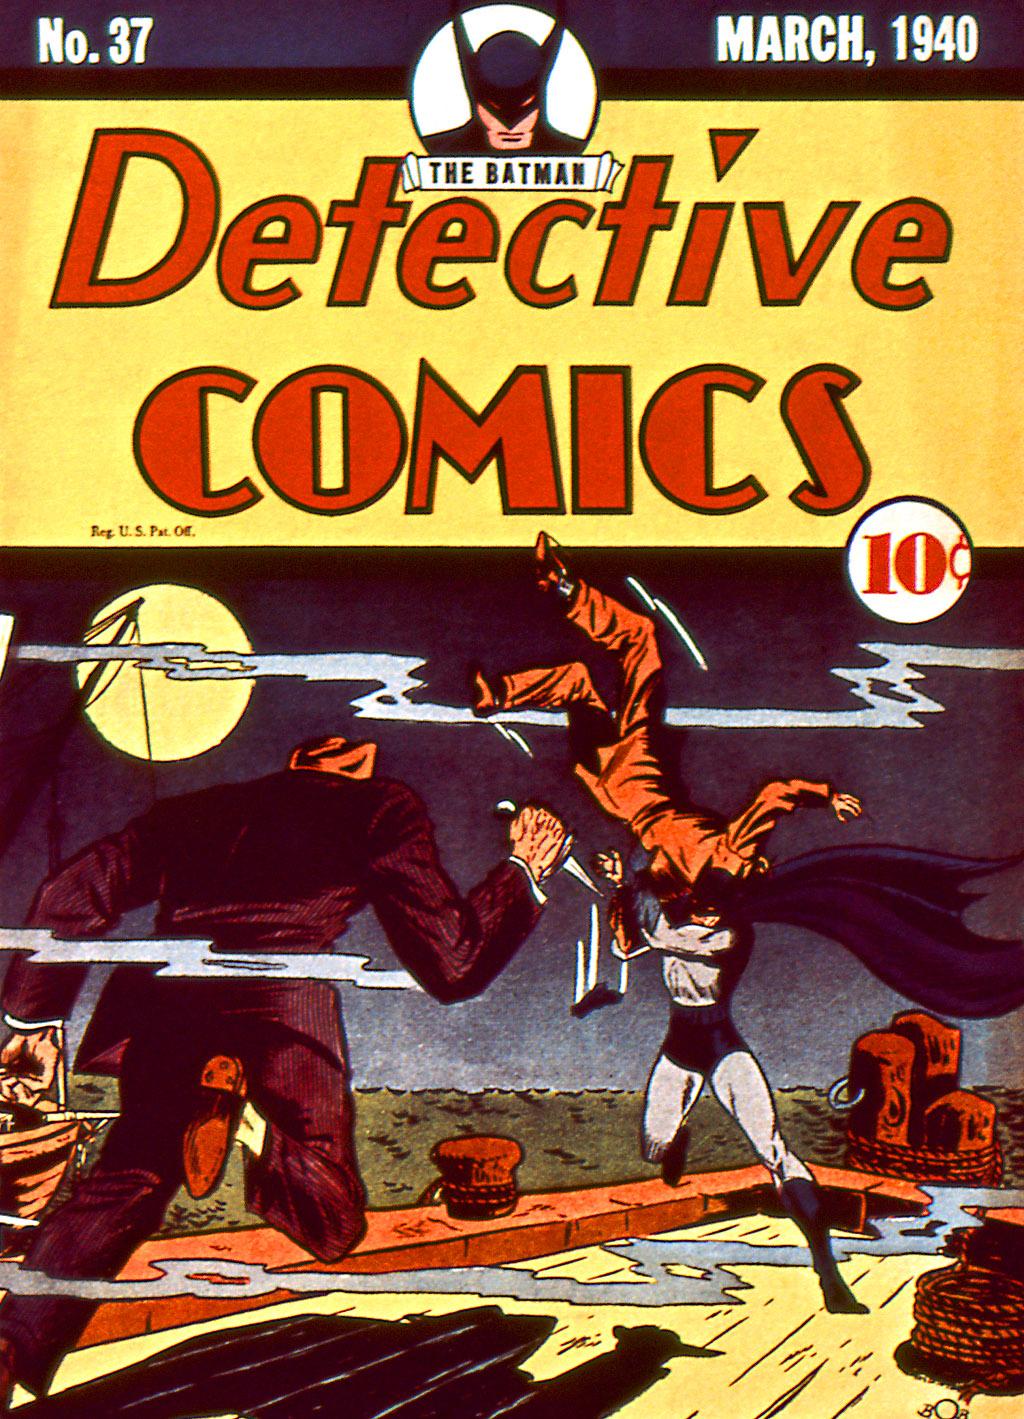 Read online Detective Comics (1937) comic -  Issue #37 - 2